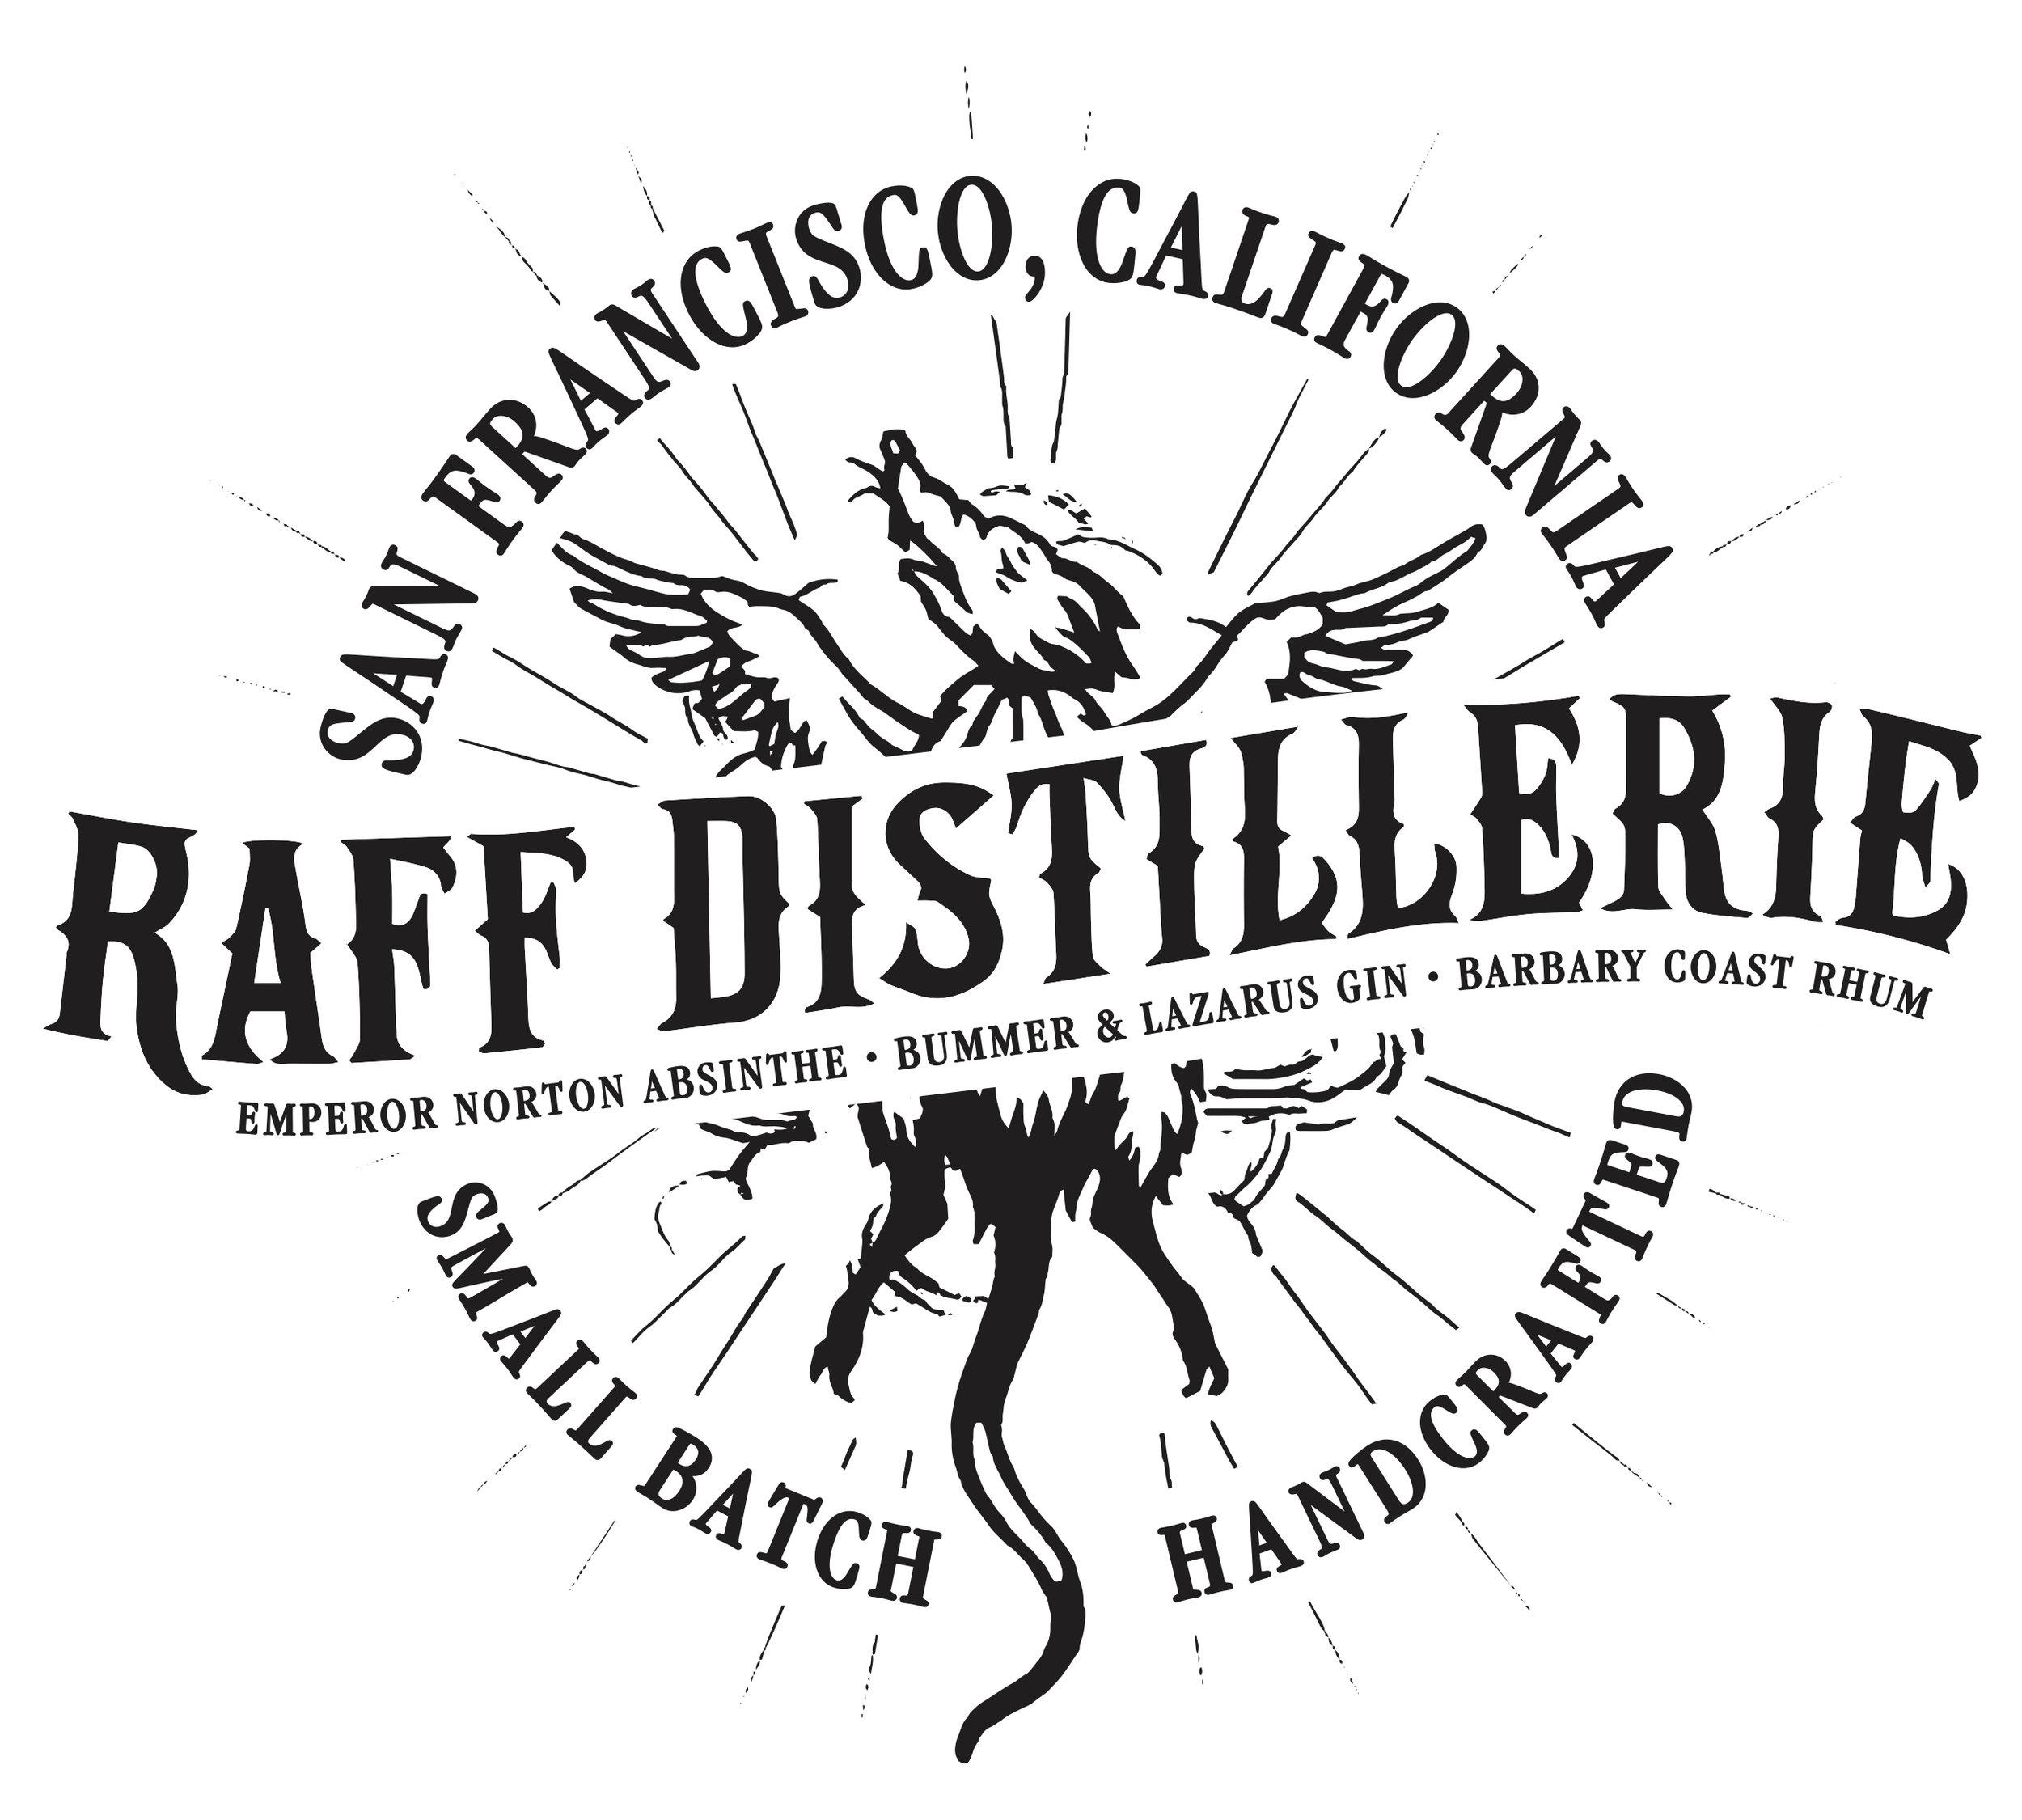 Raff_Distillerie_logo_circle.jpg